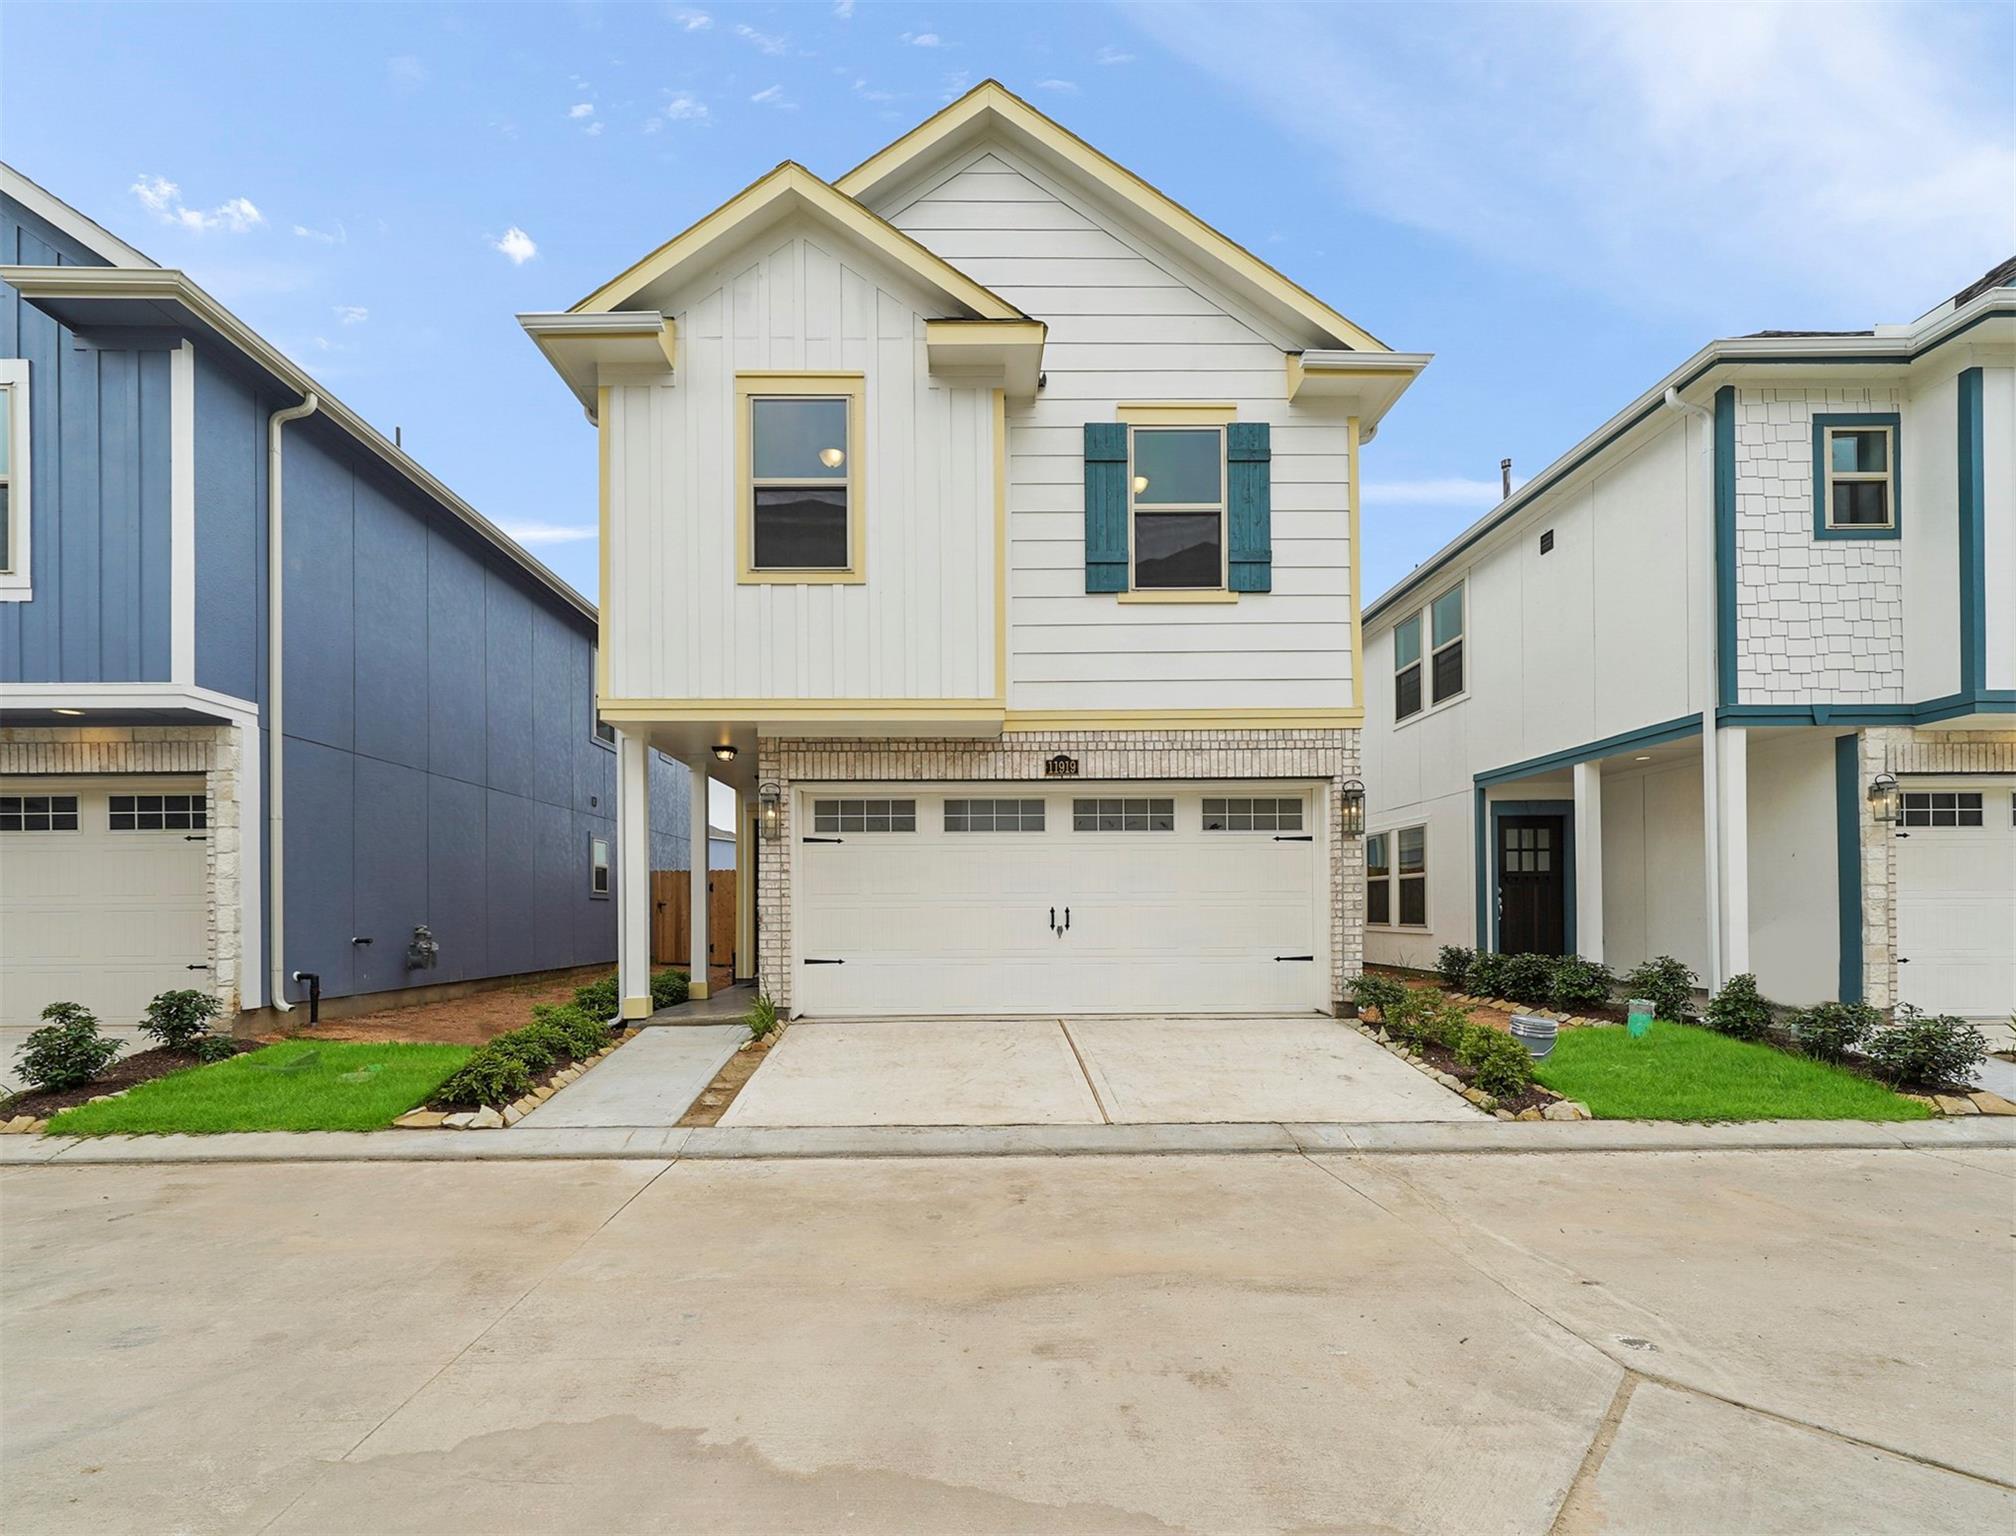 11919 Oakmont Valley Trace Property Photo - Houston, TX real estate listing